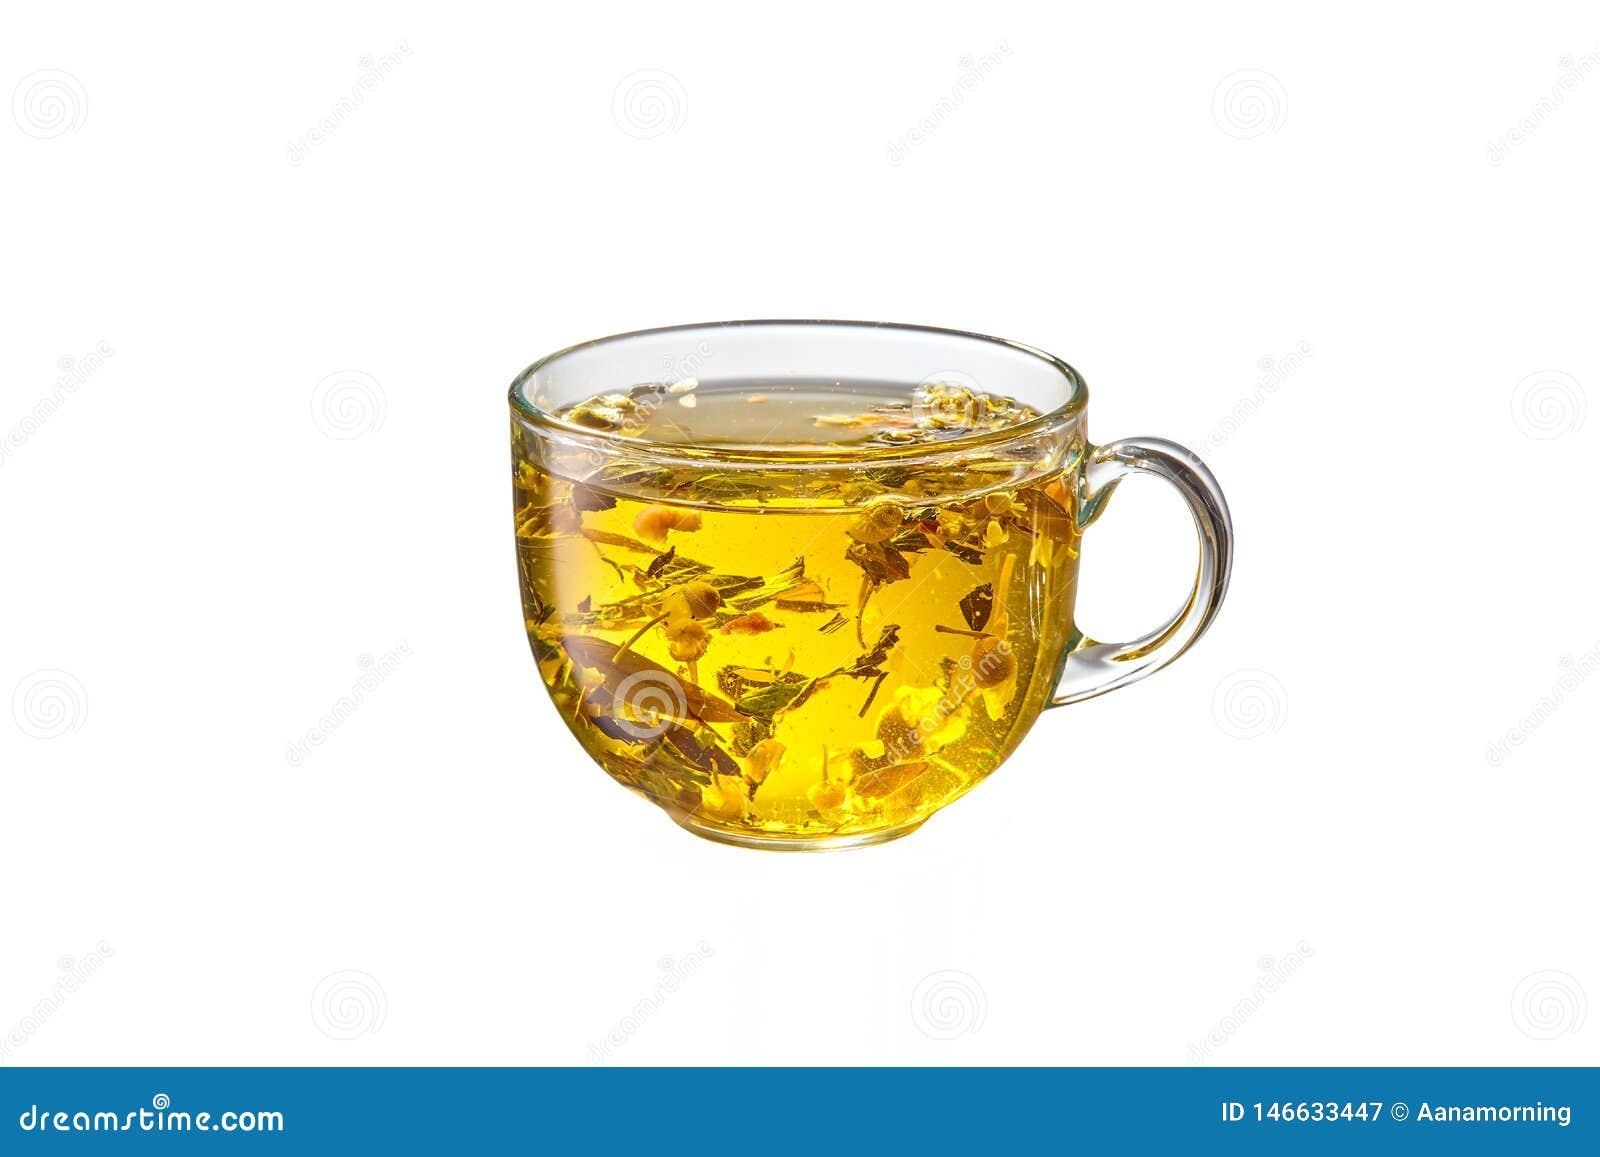 Стеклянная чашка с травяным чаем